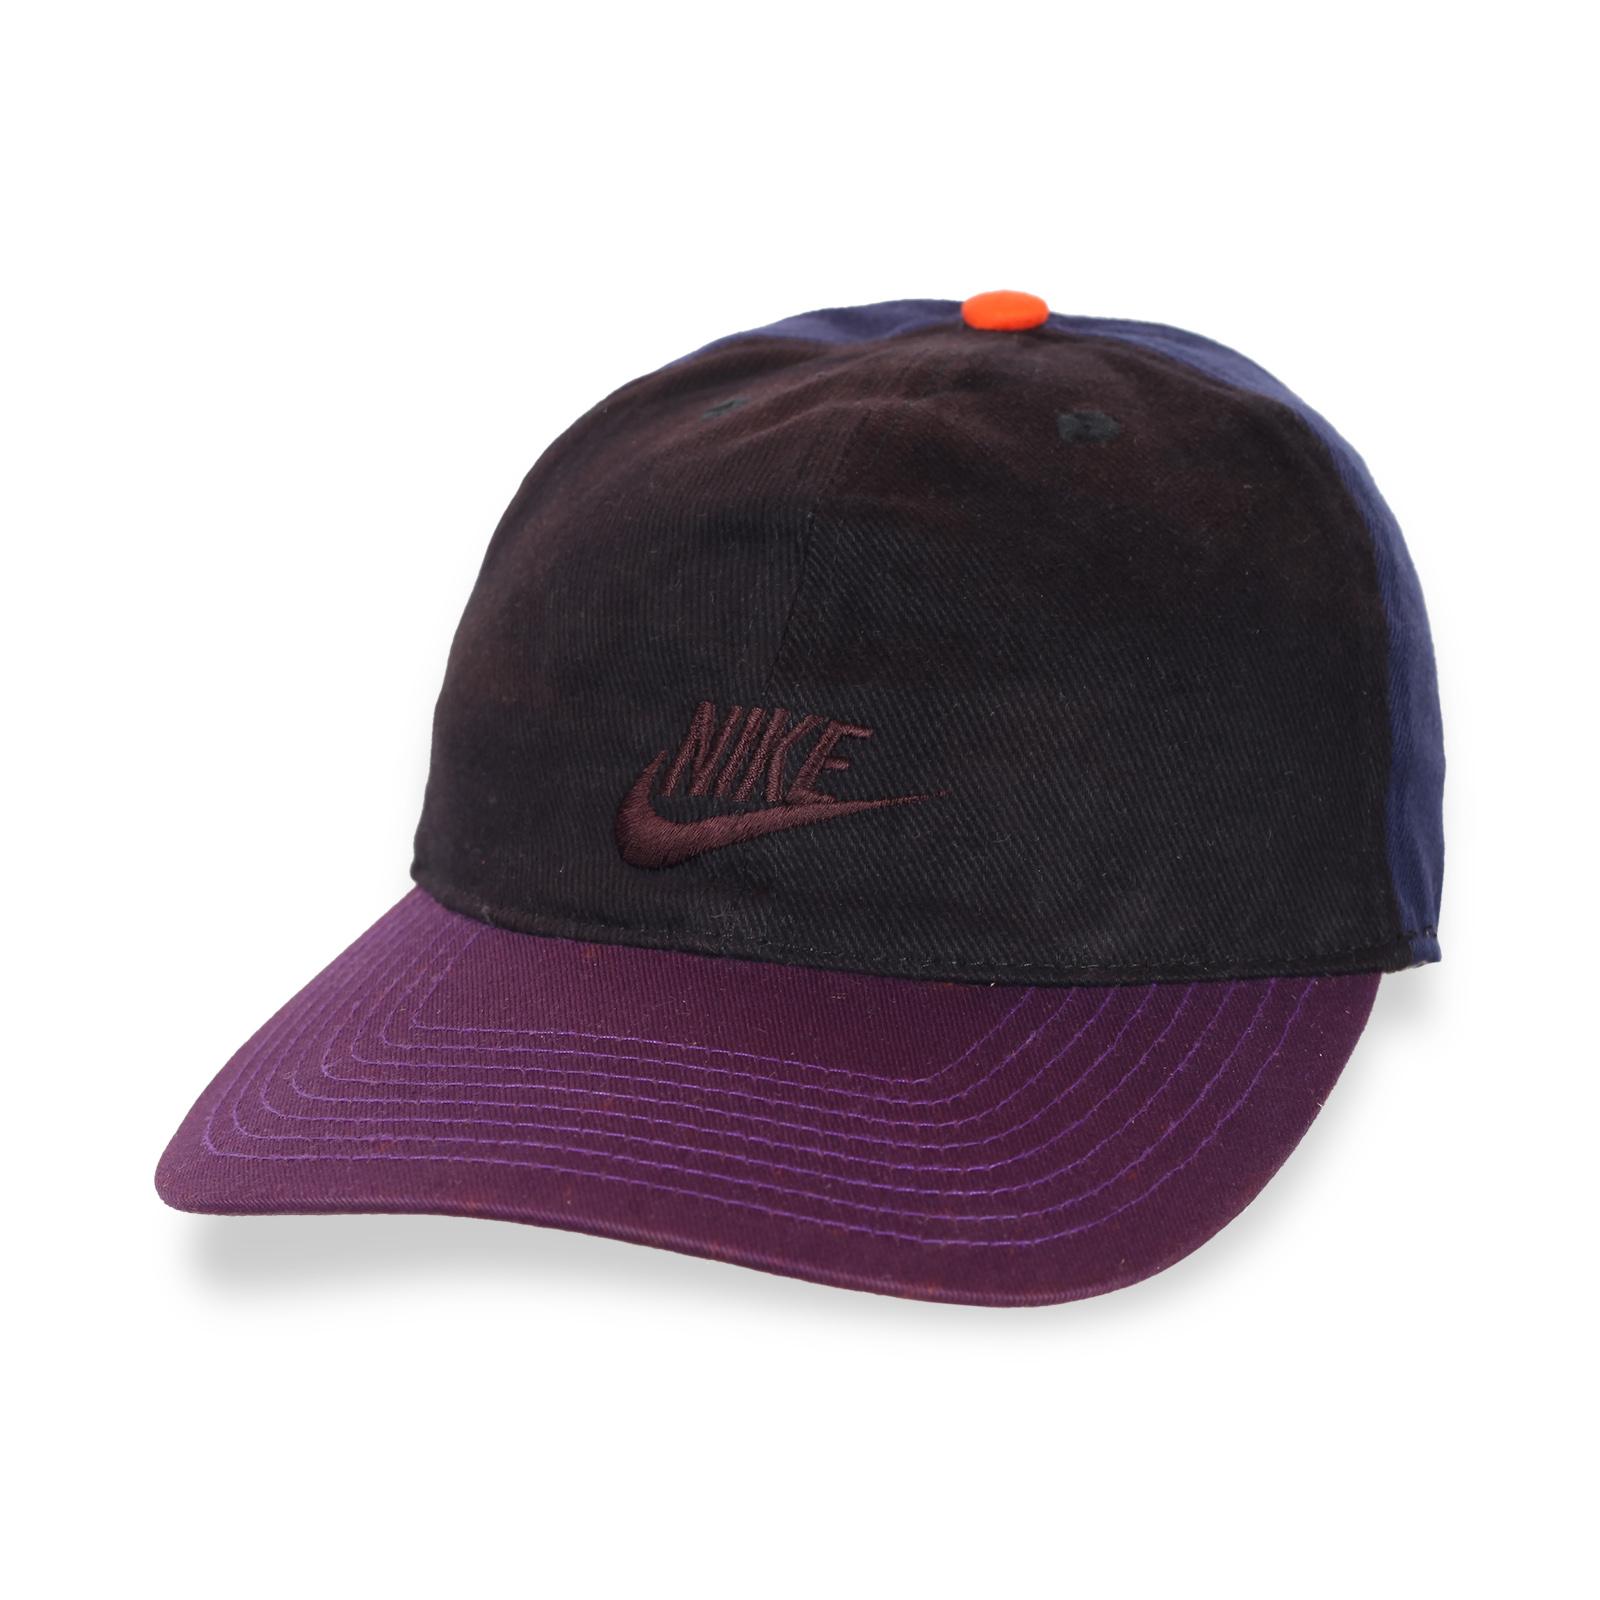 Клевая трехцветная кепка